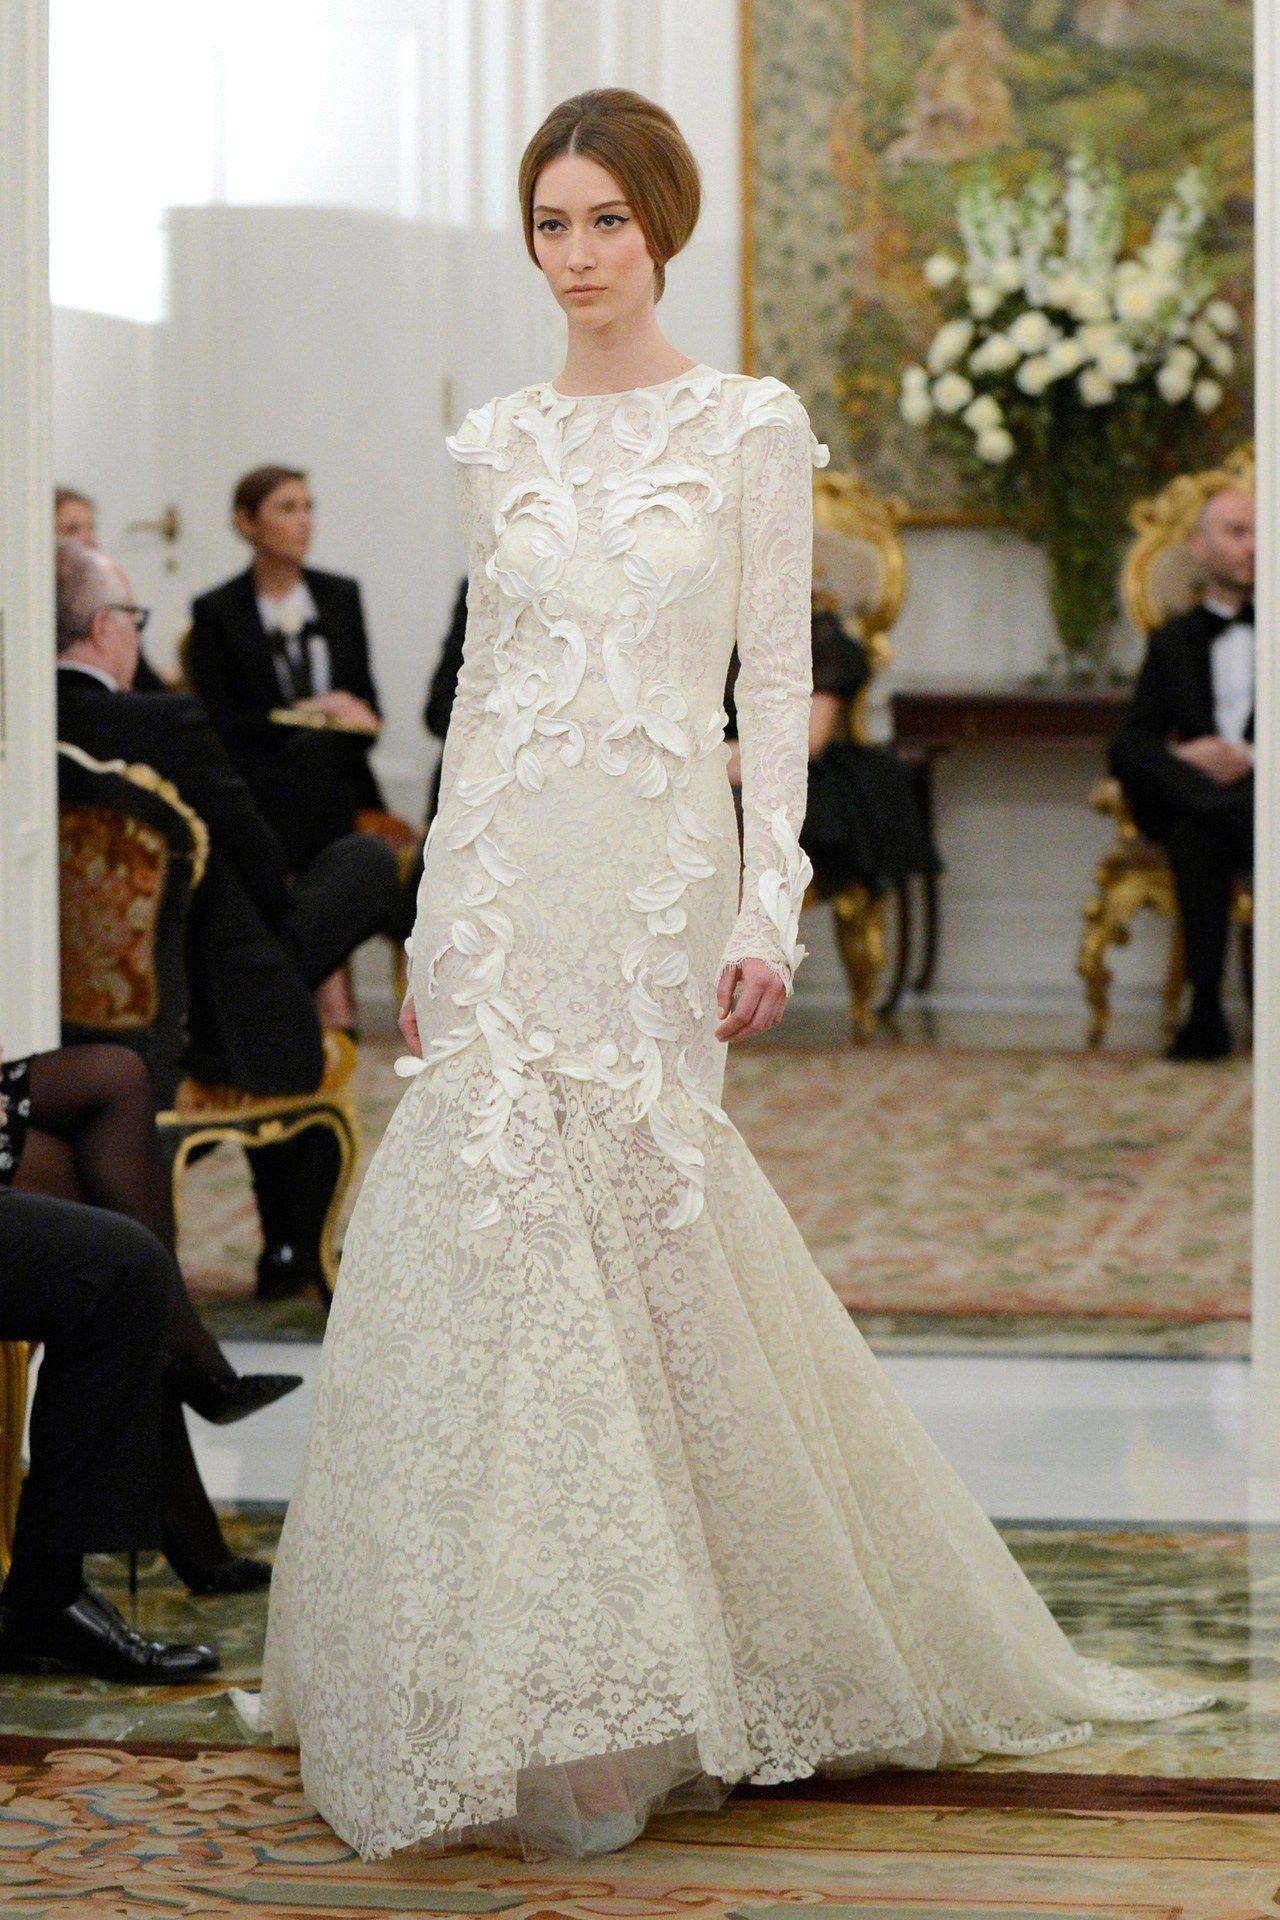 Dolce Gabbana Brautkleid Wedding Dress Rheinland Eifel Koblenz Gut